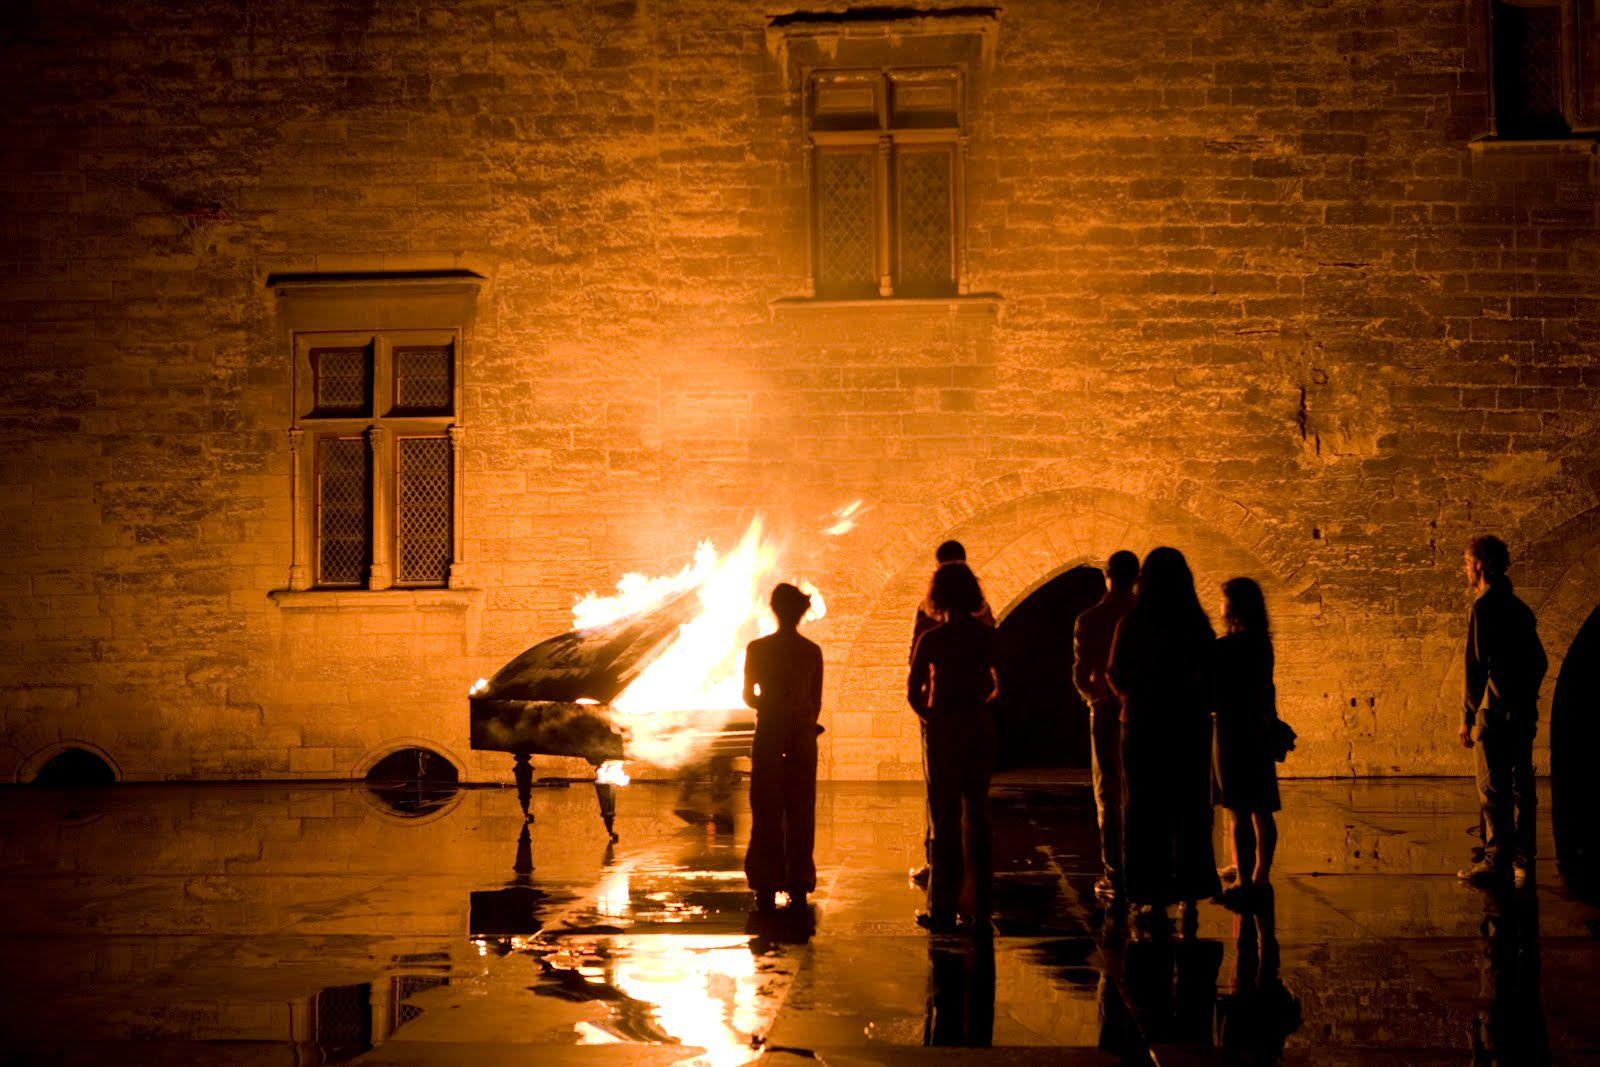 Онлайн-показ спектакля «Ад» (Inferno) Ромео Кастеллуччи фото 1